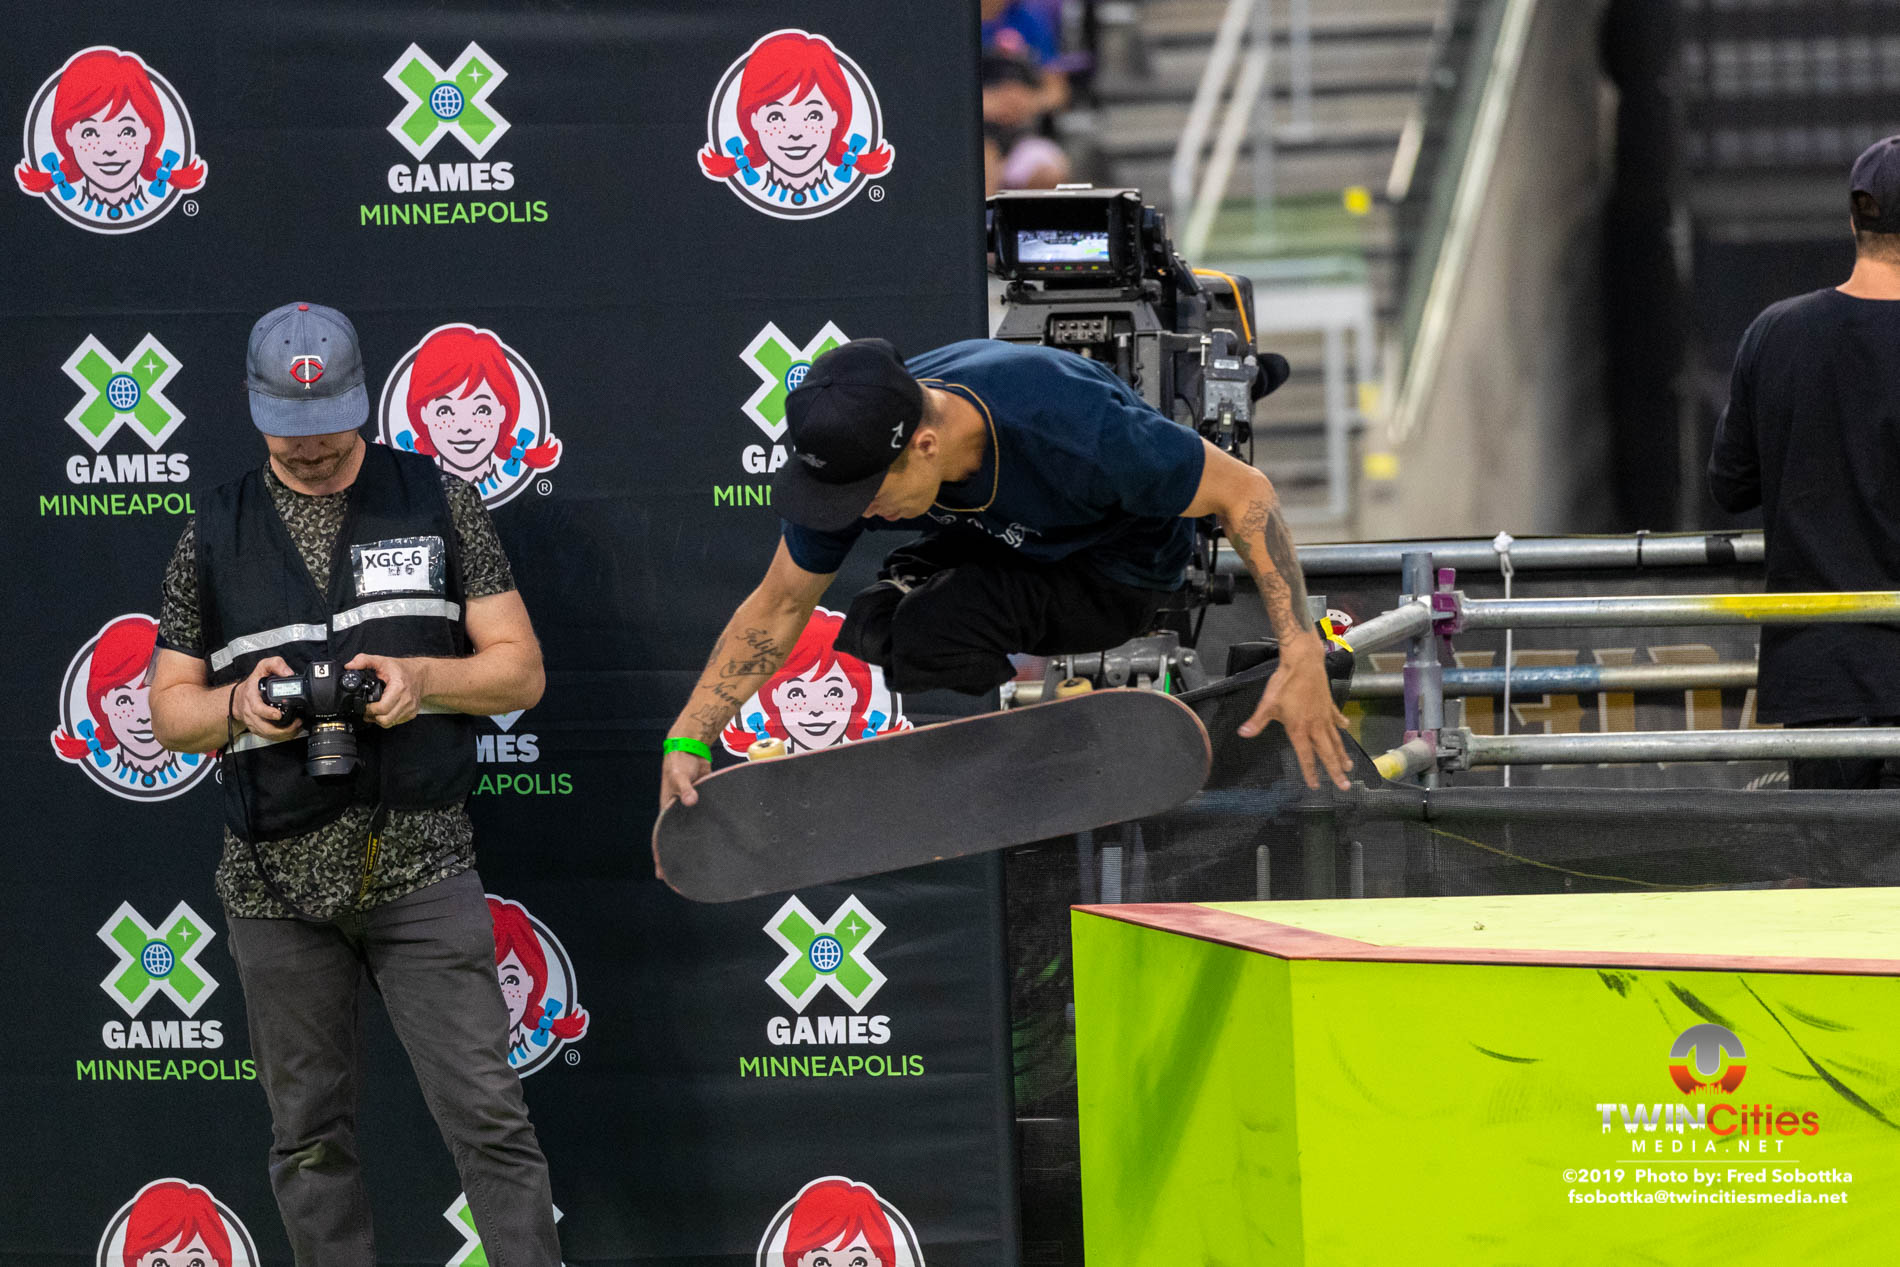 Adaptive-Skateboard-Park-11